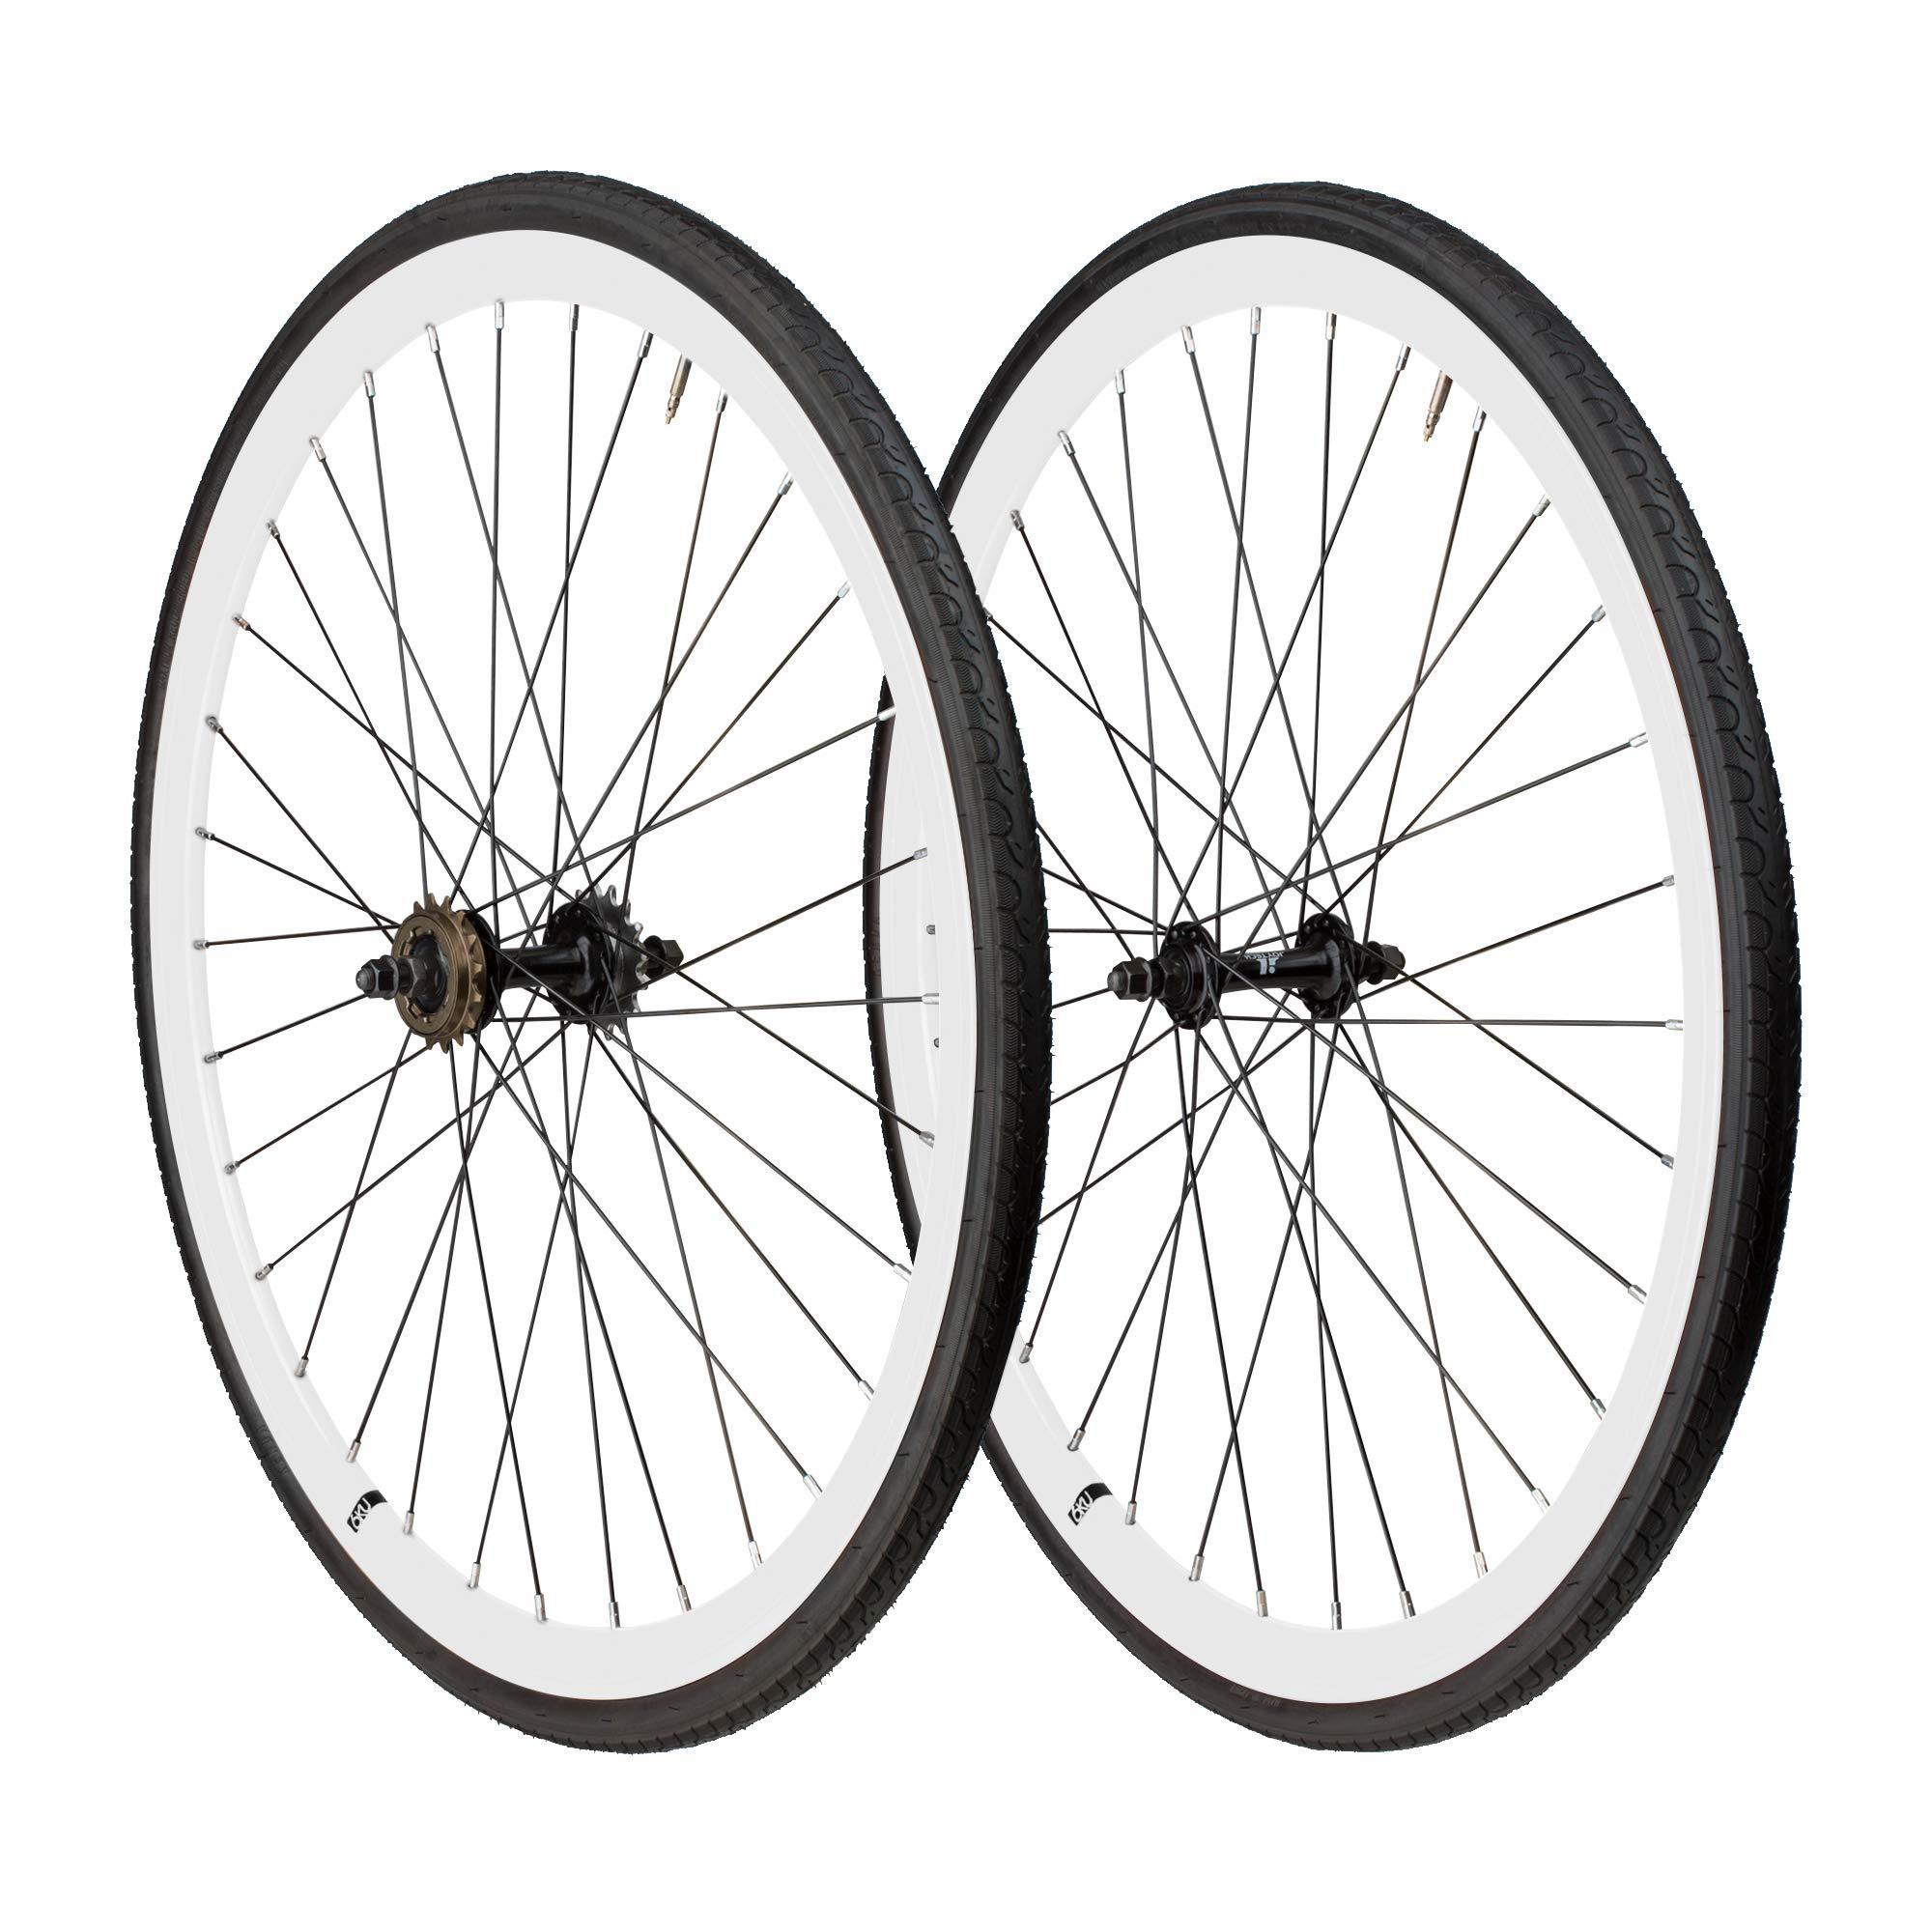 6KU 700C Deep V Alloy Fixie Wheelset, Gloss White